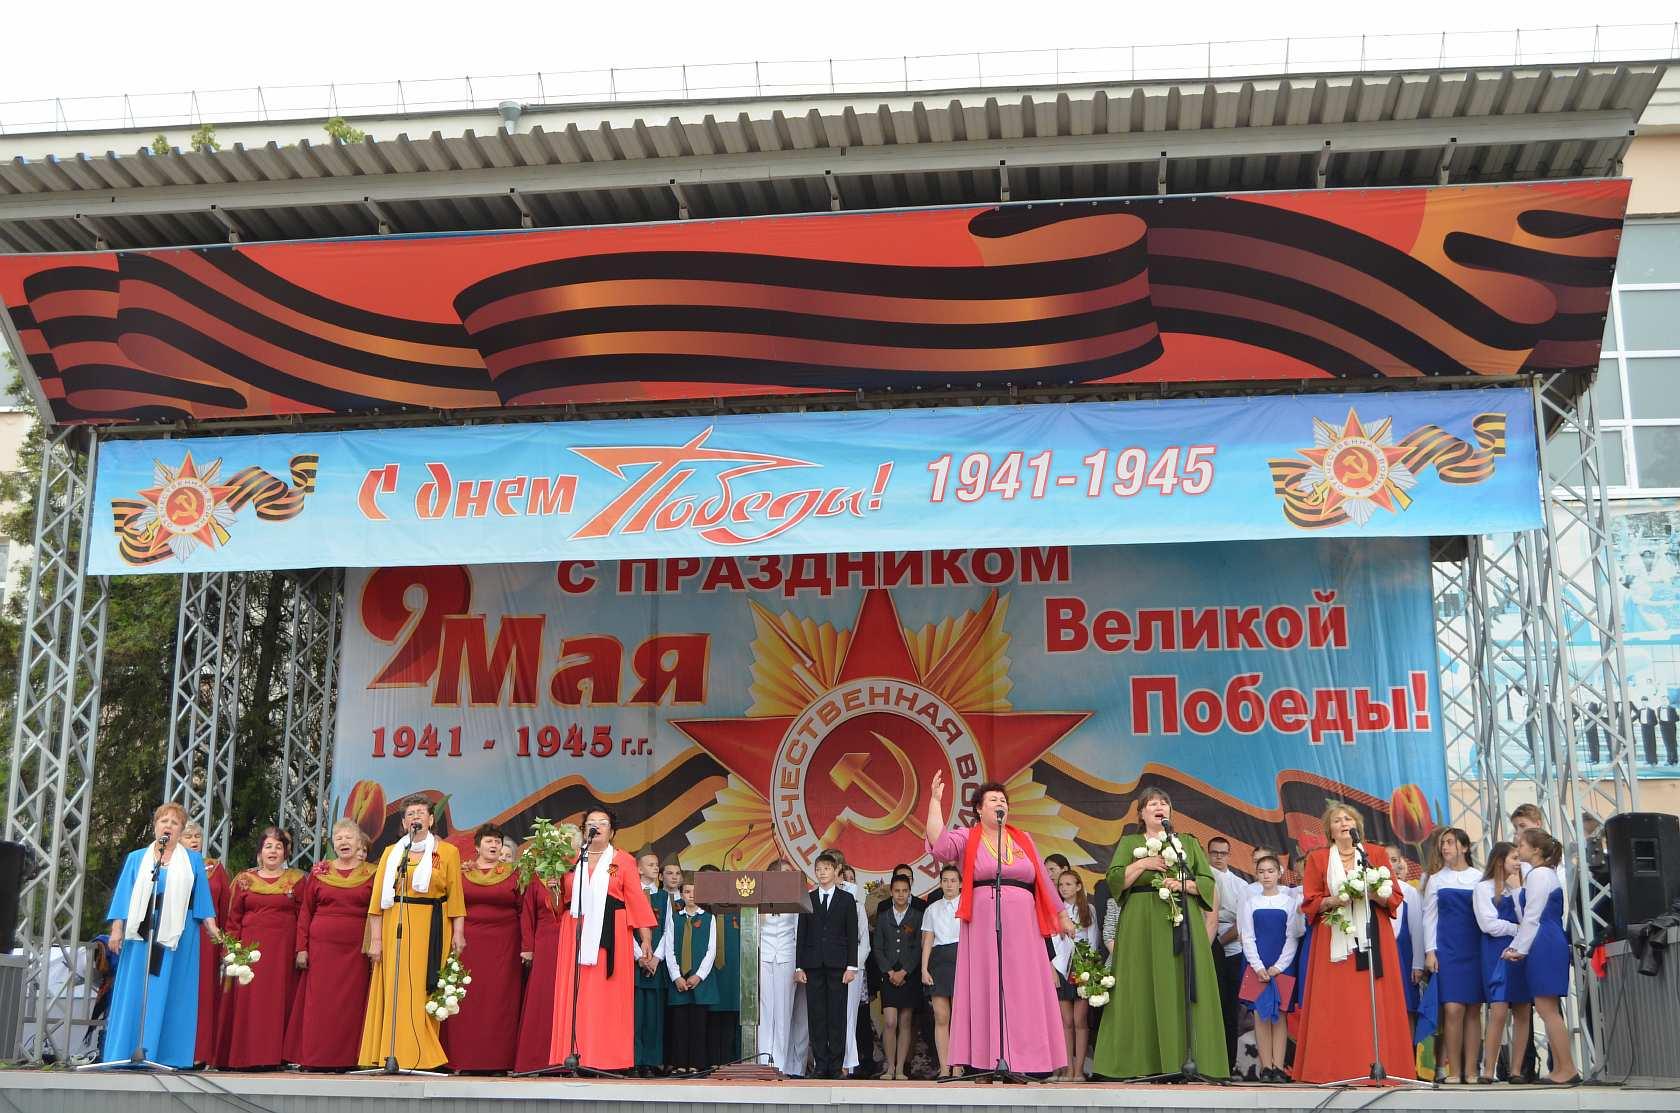 http://www.korenovsk.ru/wp-content/uploads/2017/05/DSC_00041.jpg